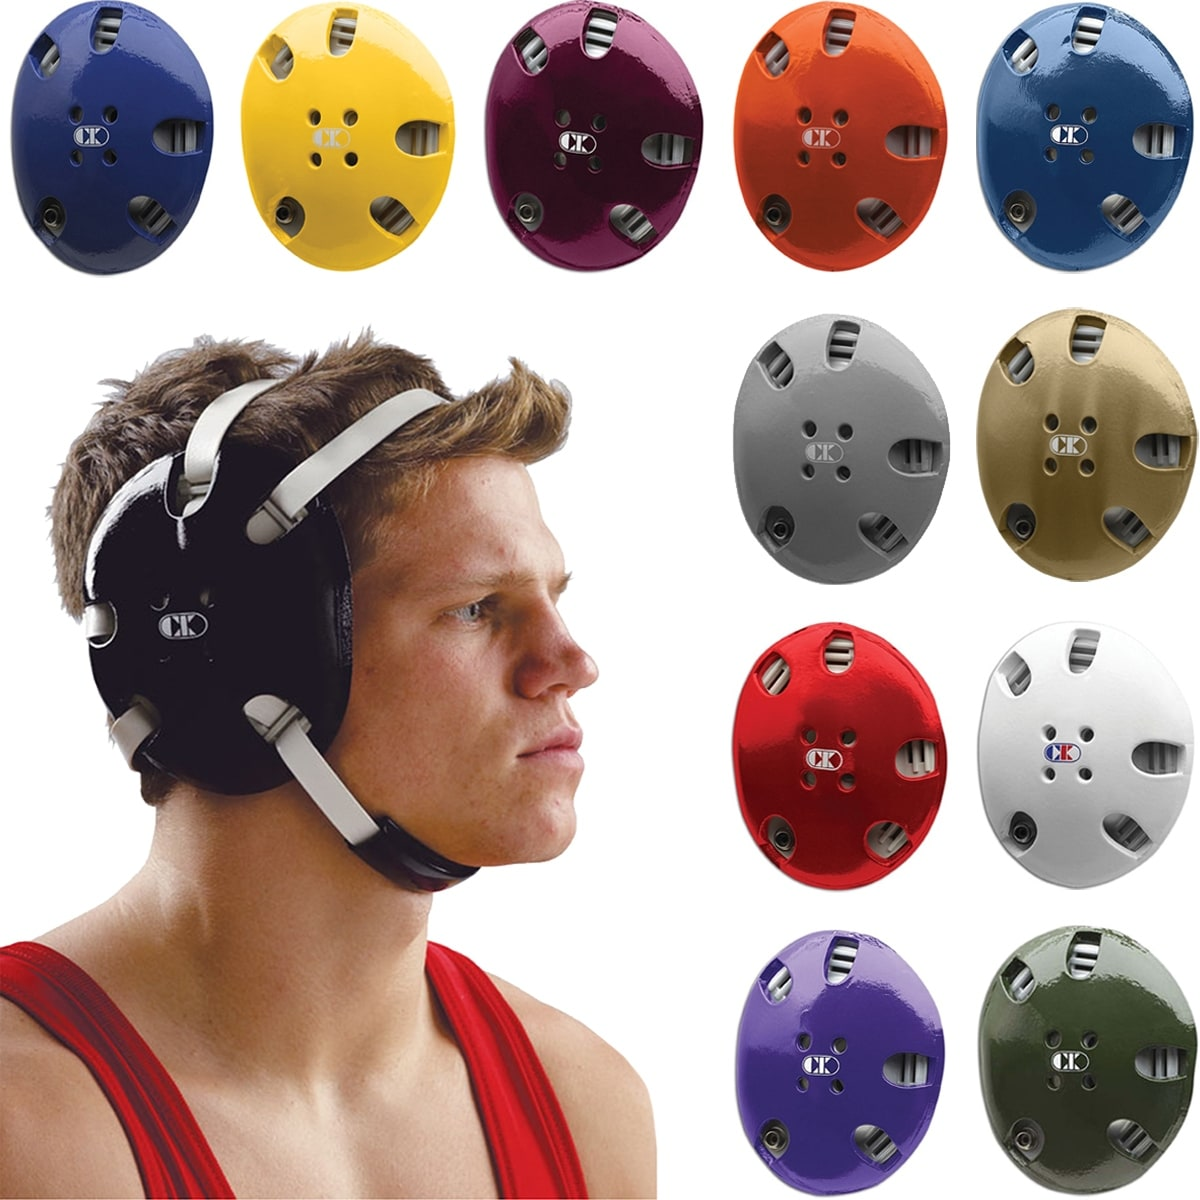 Pink//Black Cliff Keen E58 Signature Wrestling Headgear